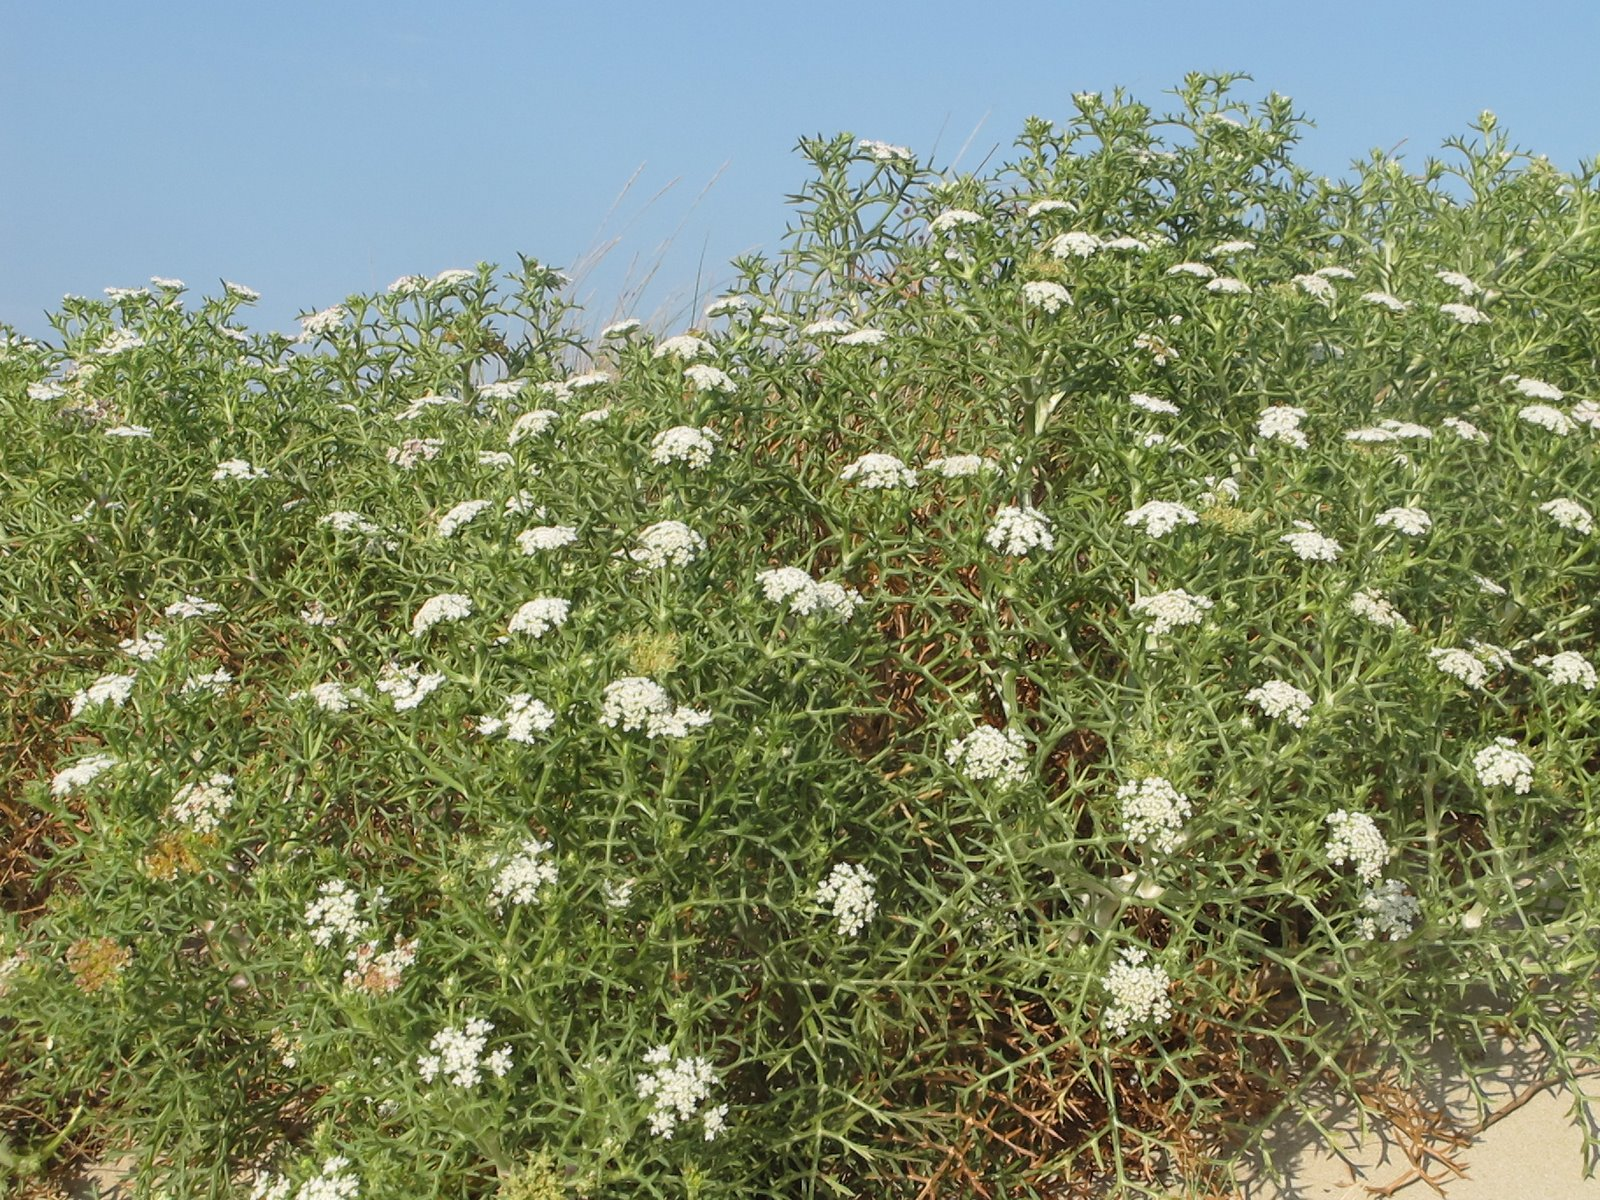 Echinophora spinosa L. Apiaceae – Finocchio litorale – (6)